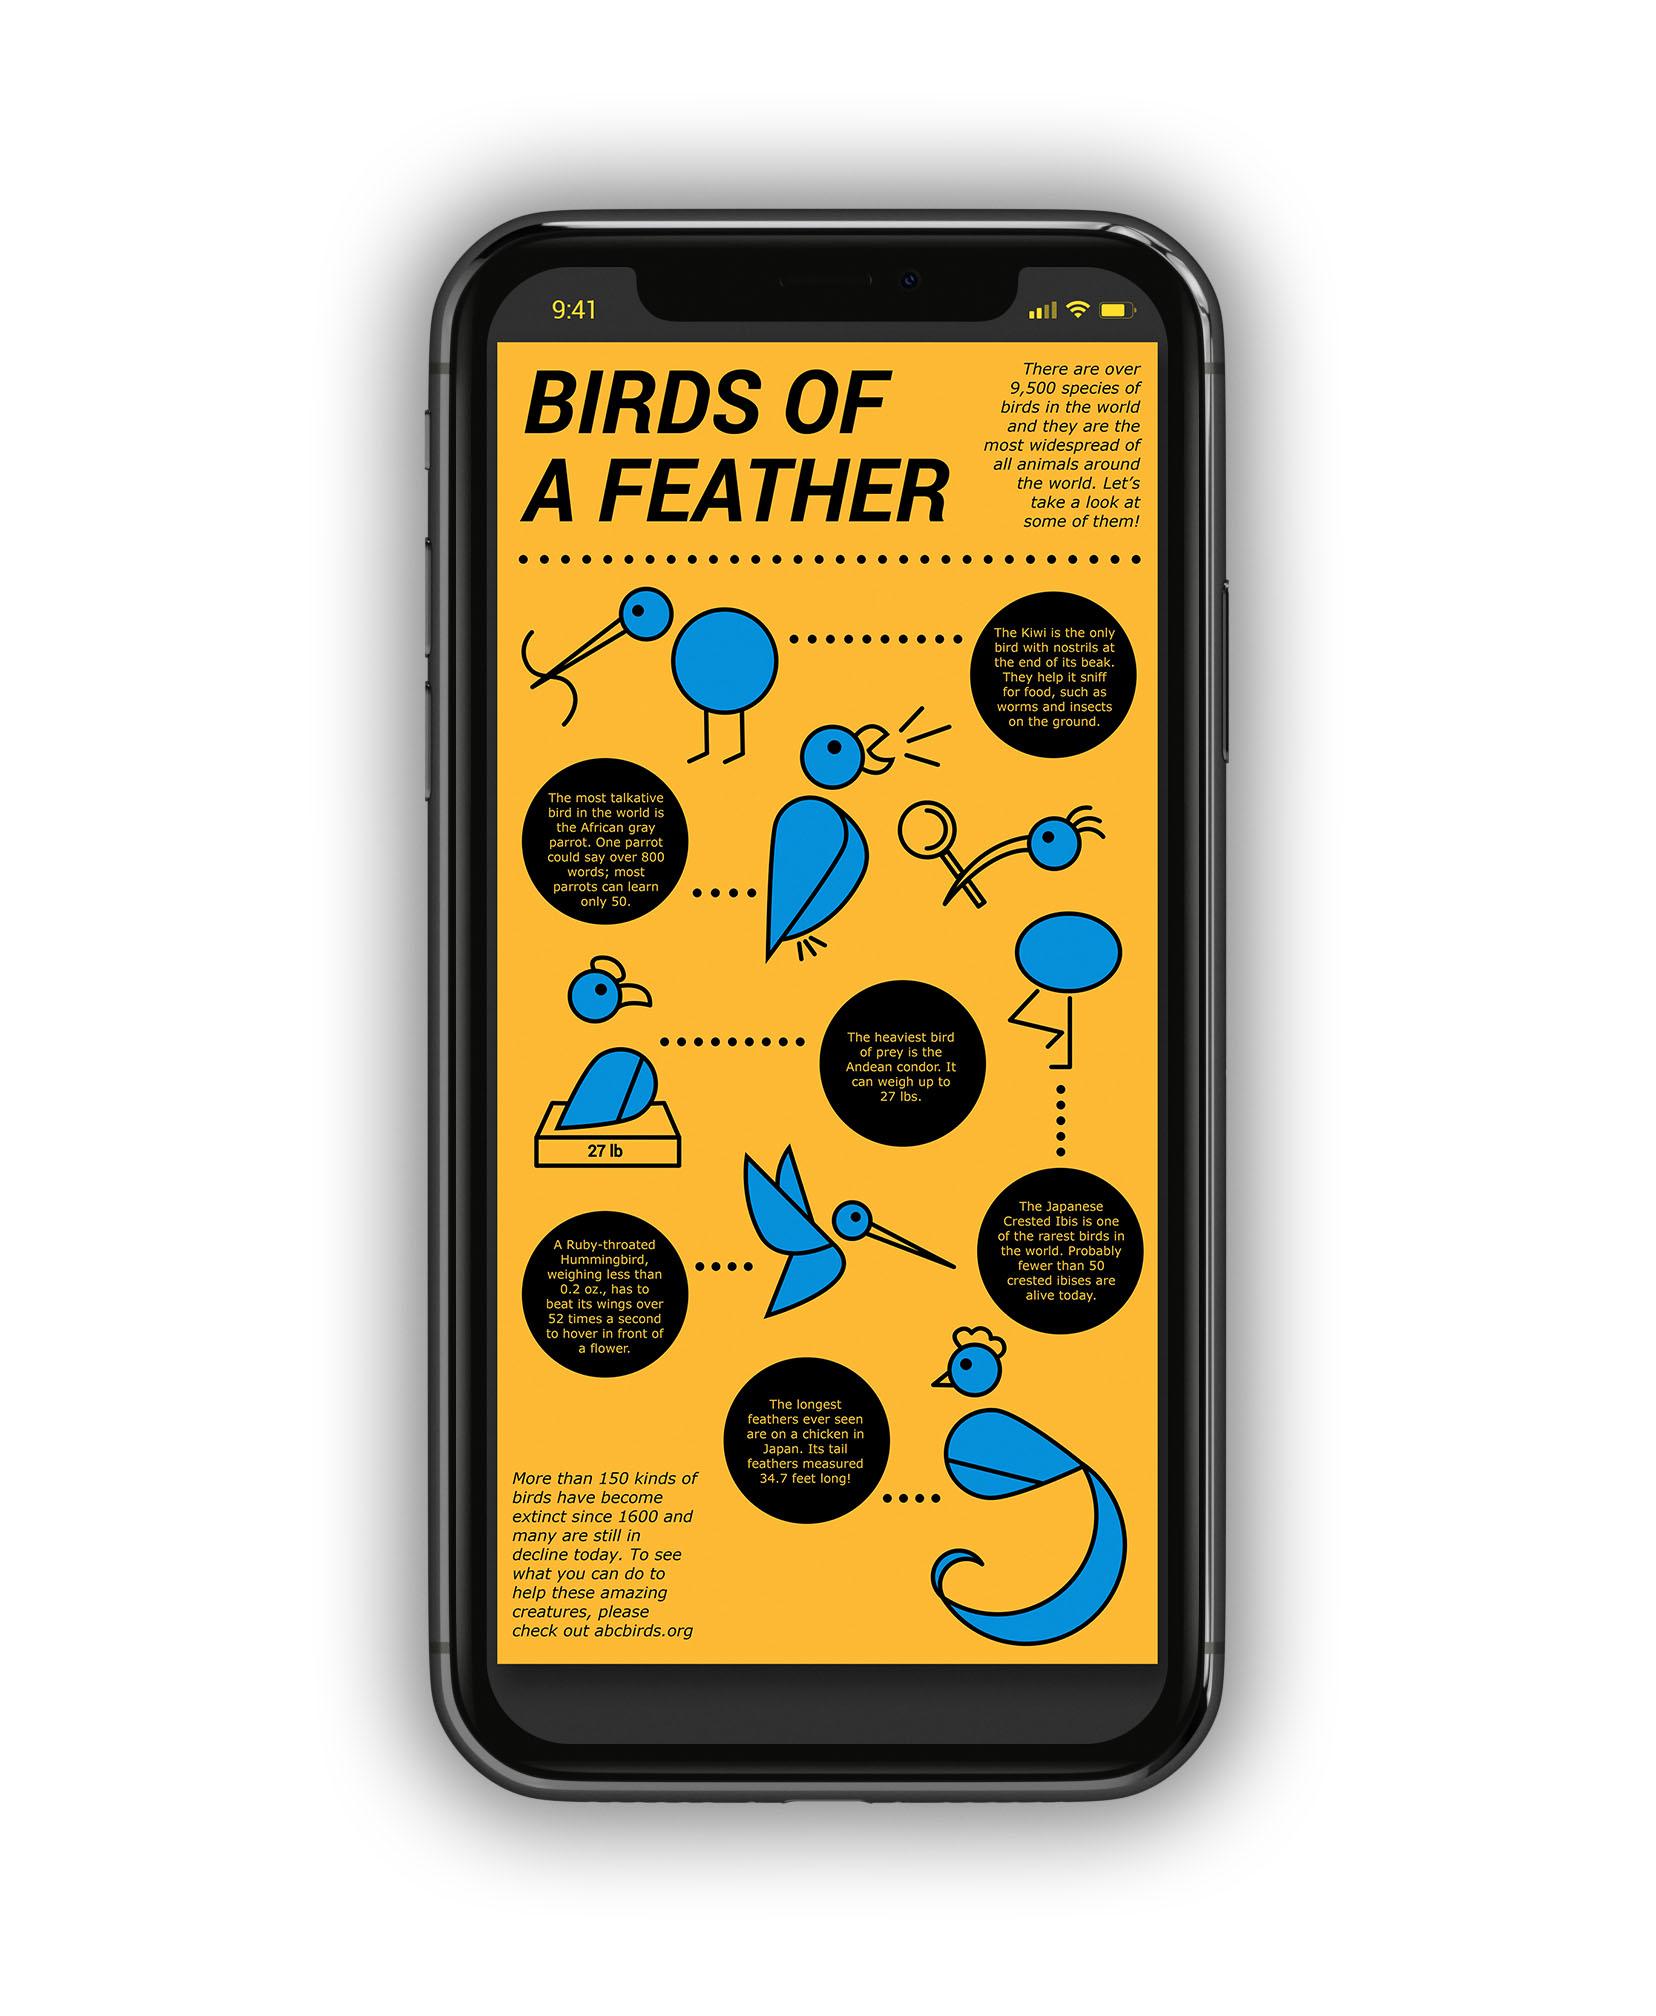 BirdInfographic_MU4.jpg